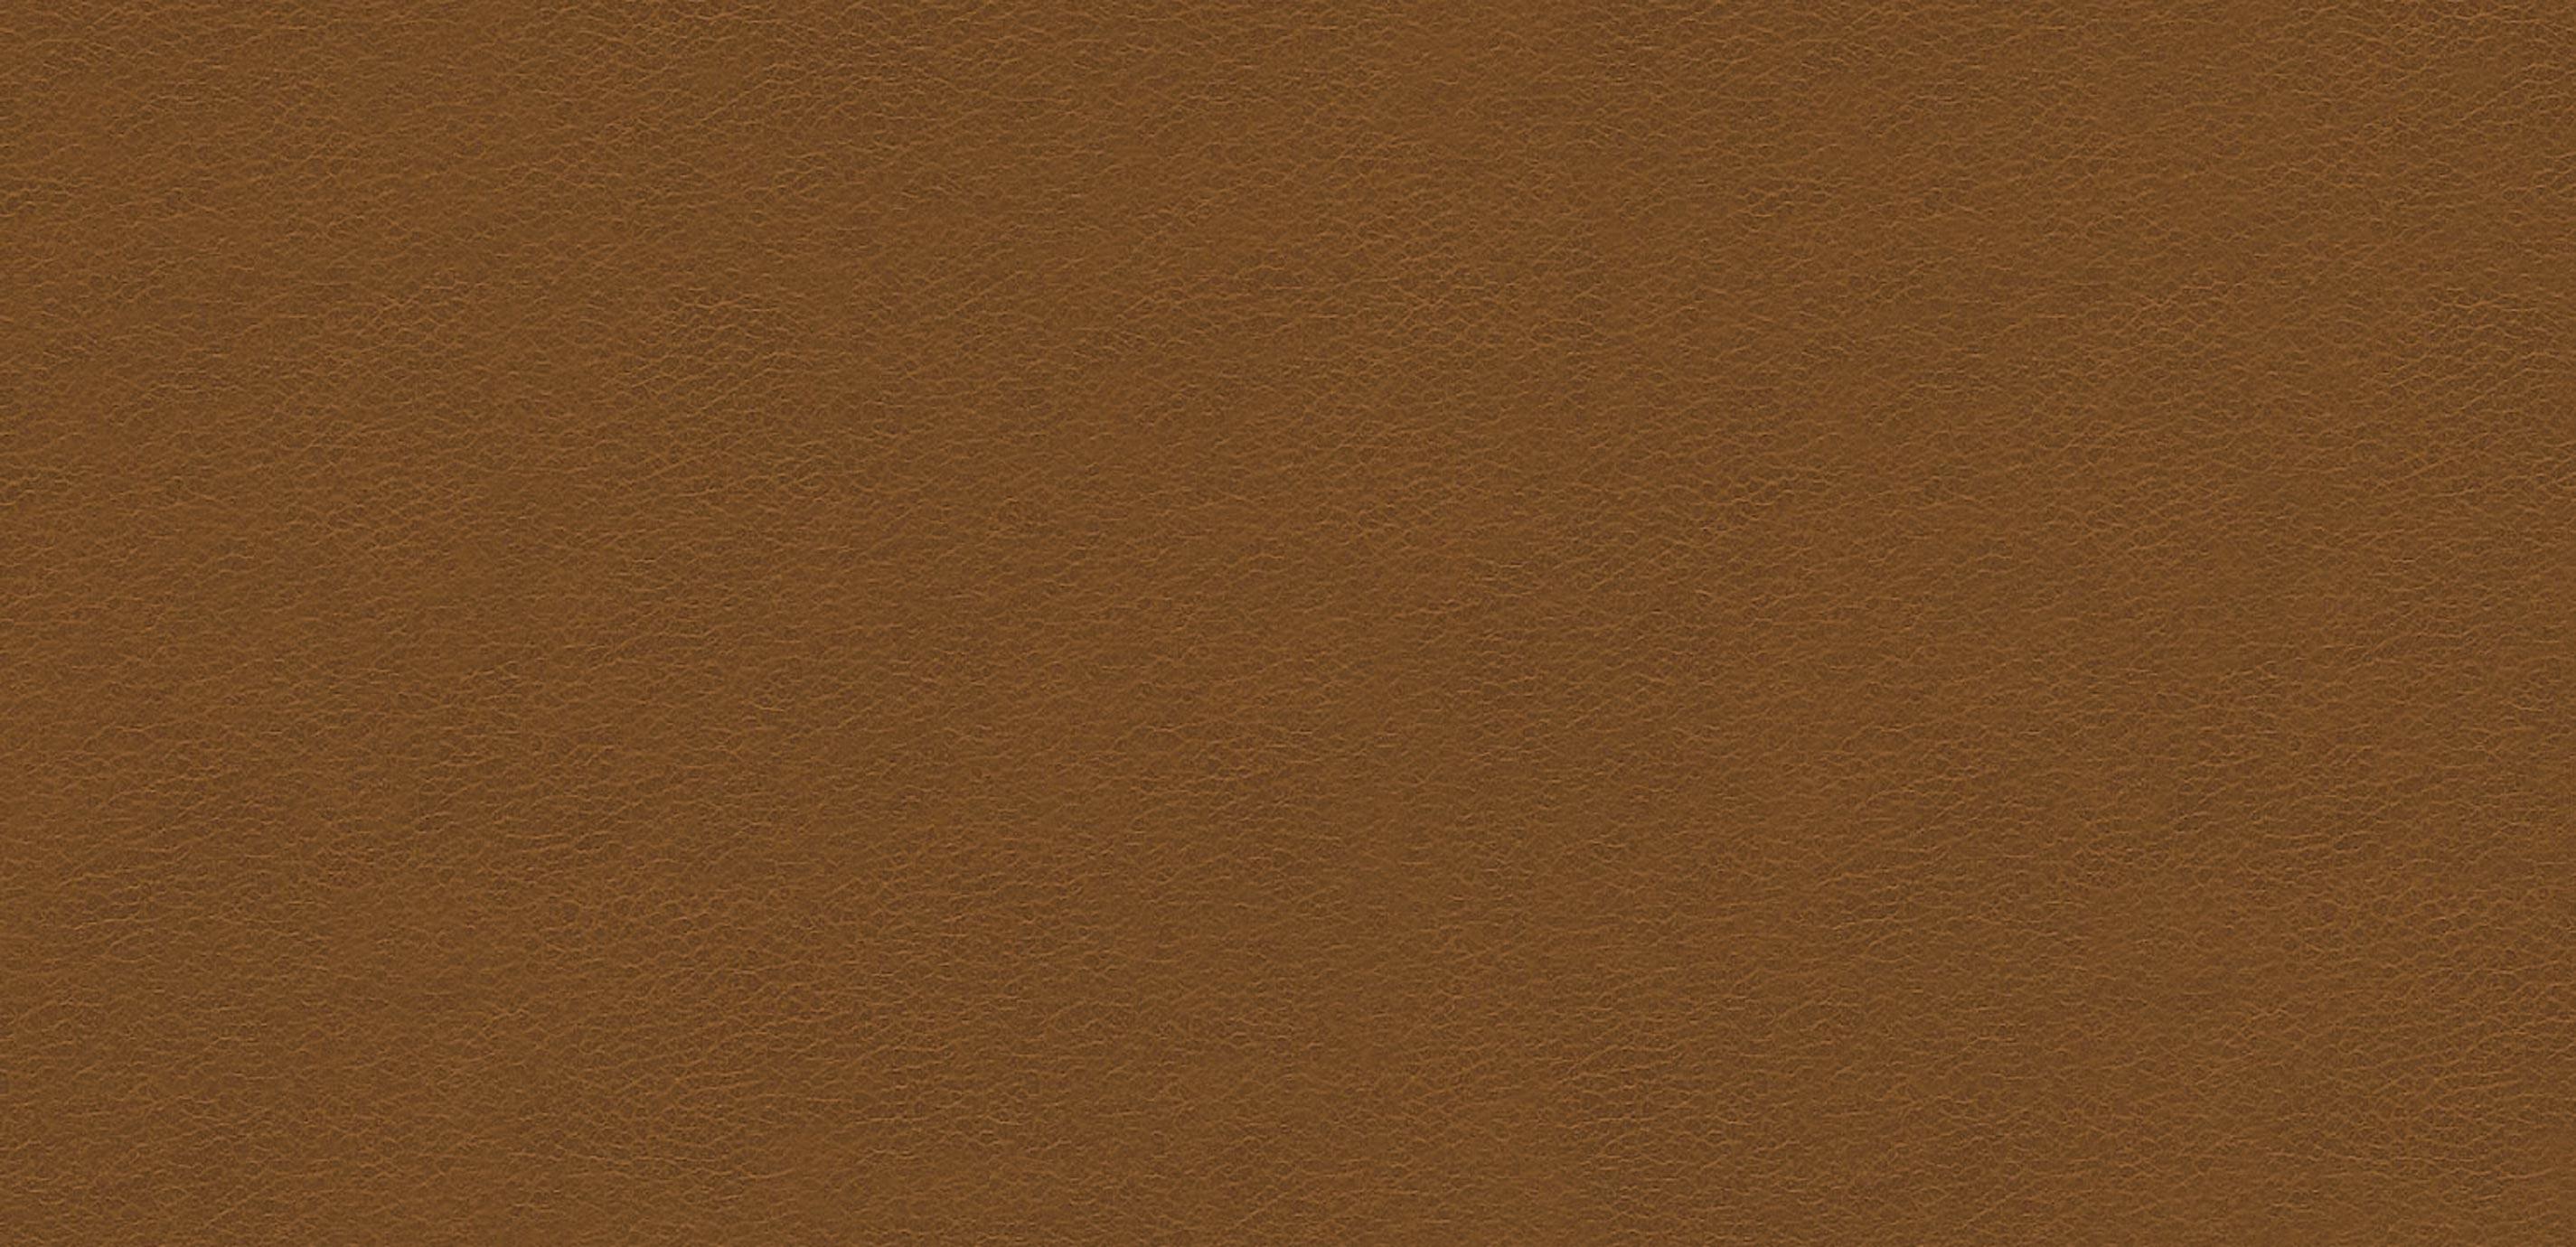 Omni Light Brown Leather Swatch - Ethan Allen | Ethan Allen